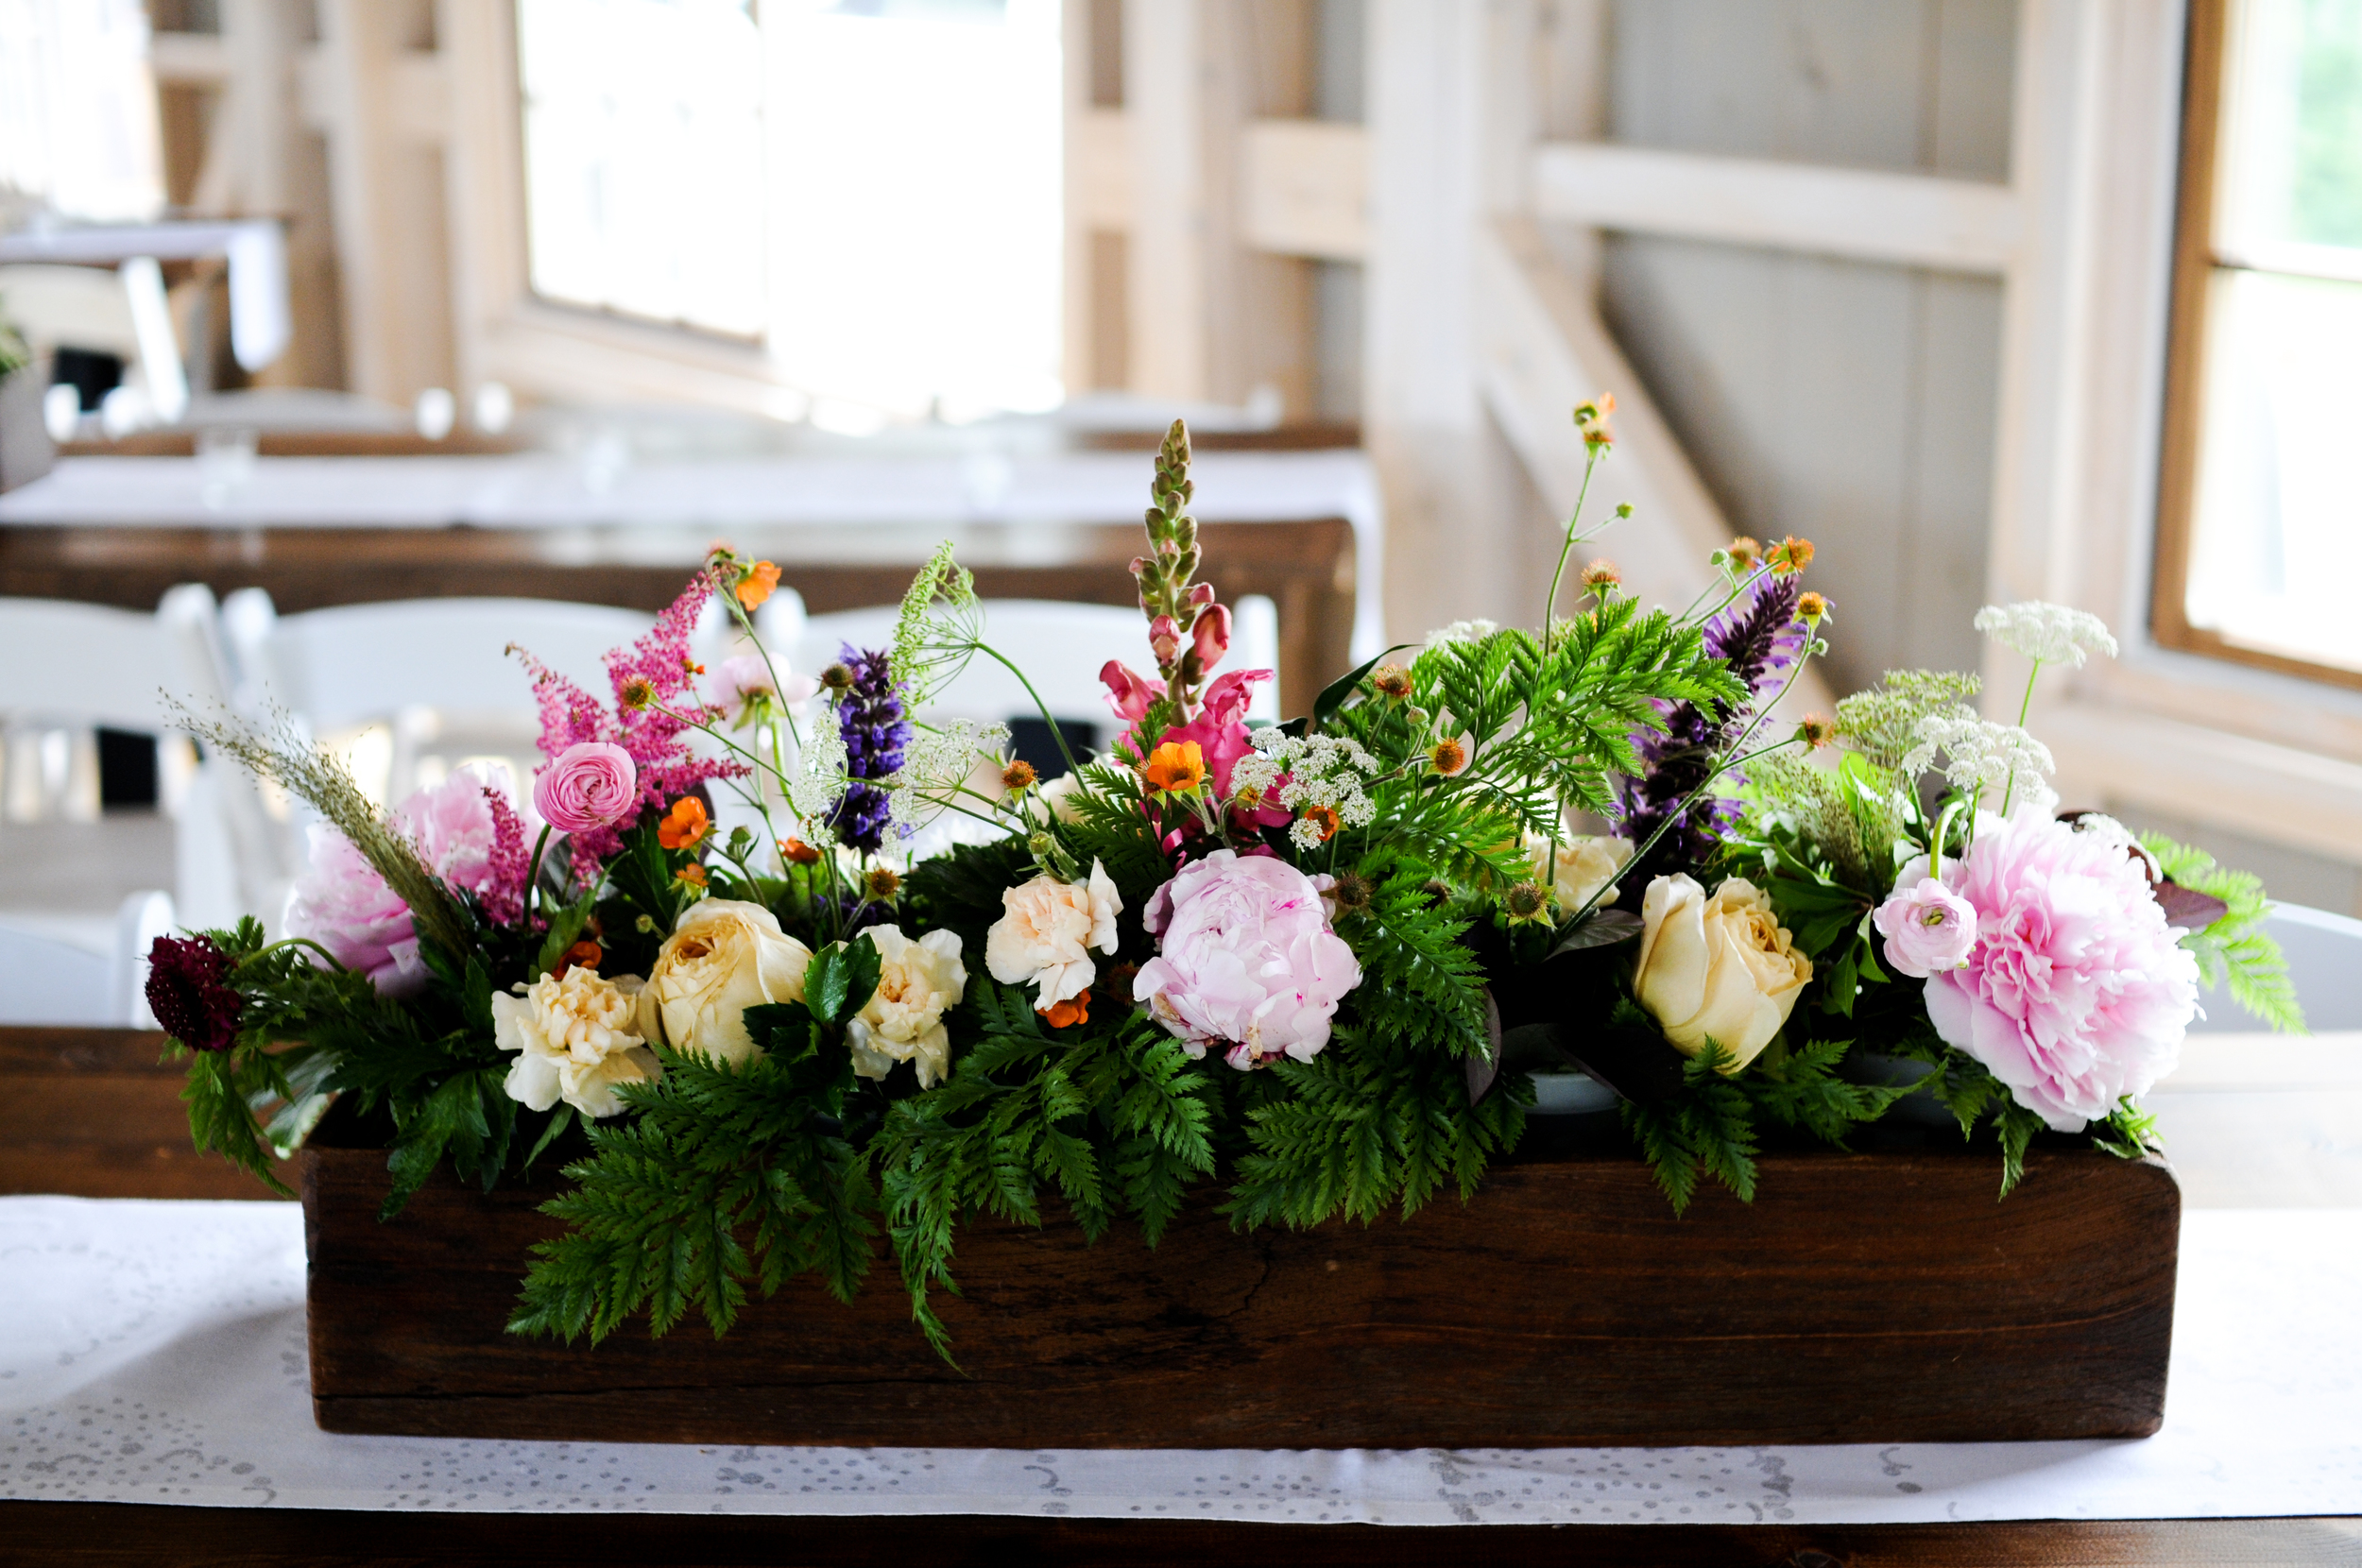 Coastal Maine wedding with Jewish traditions